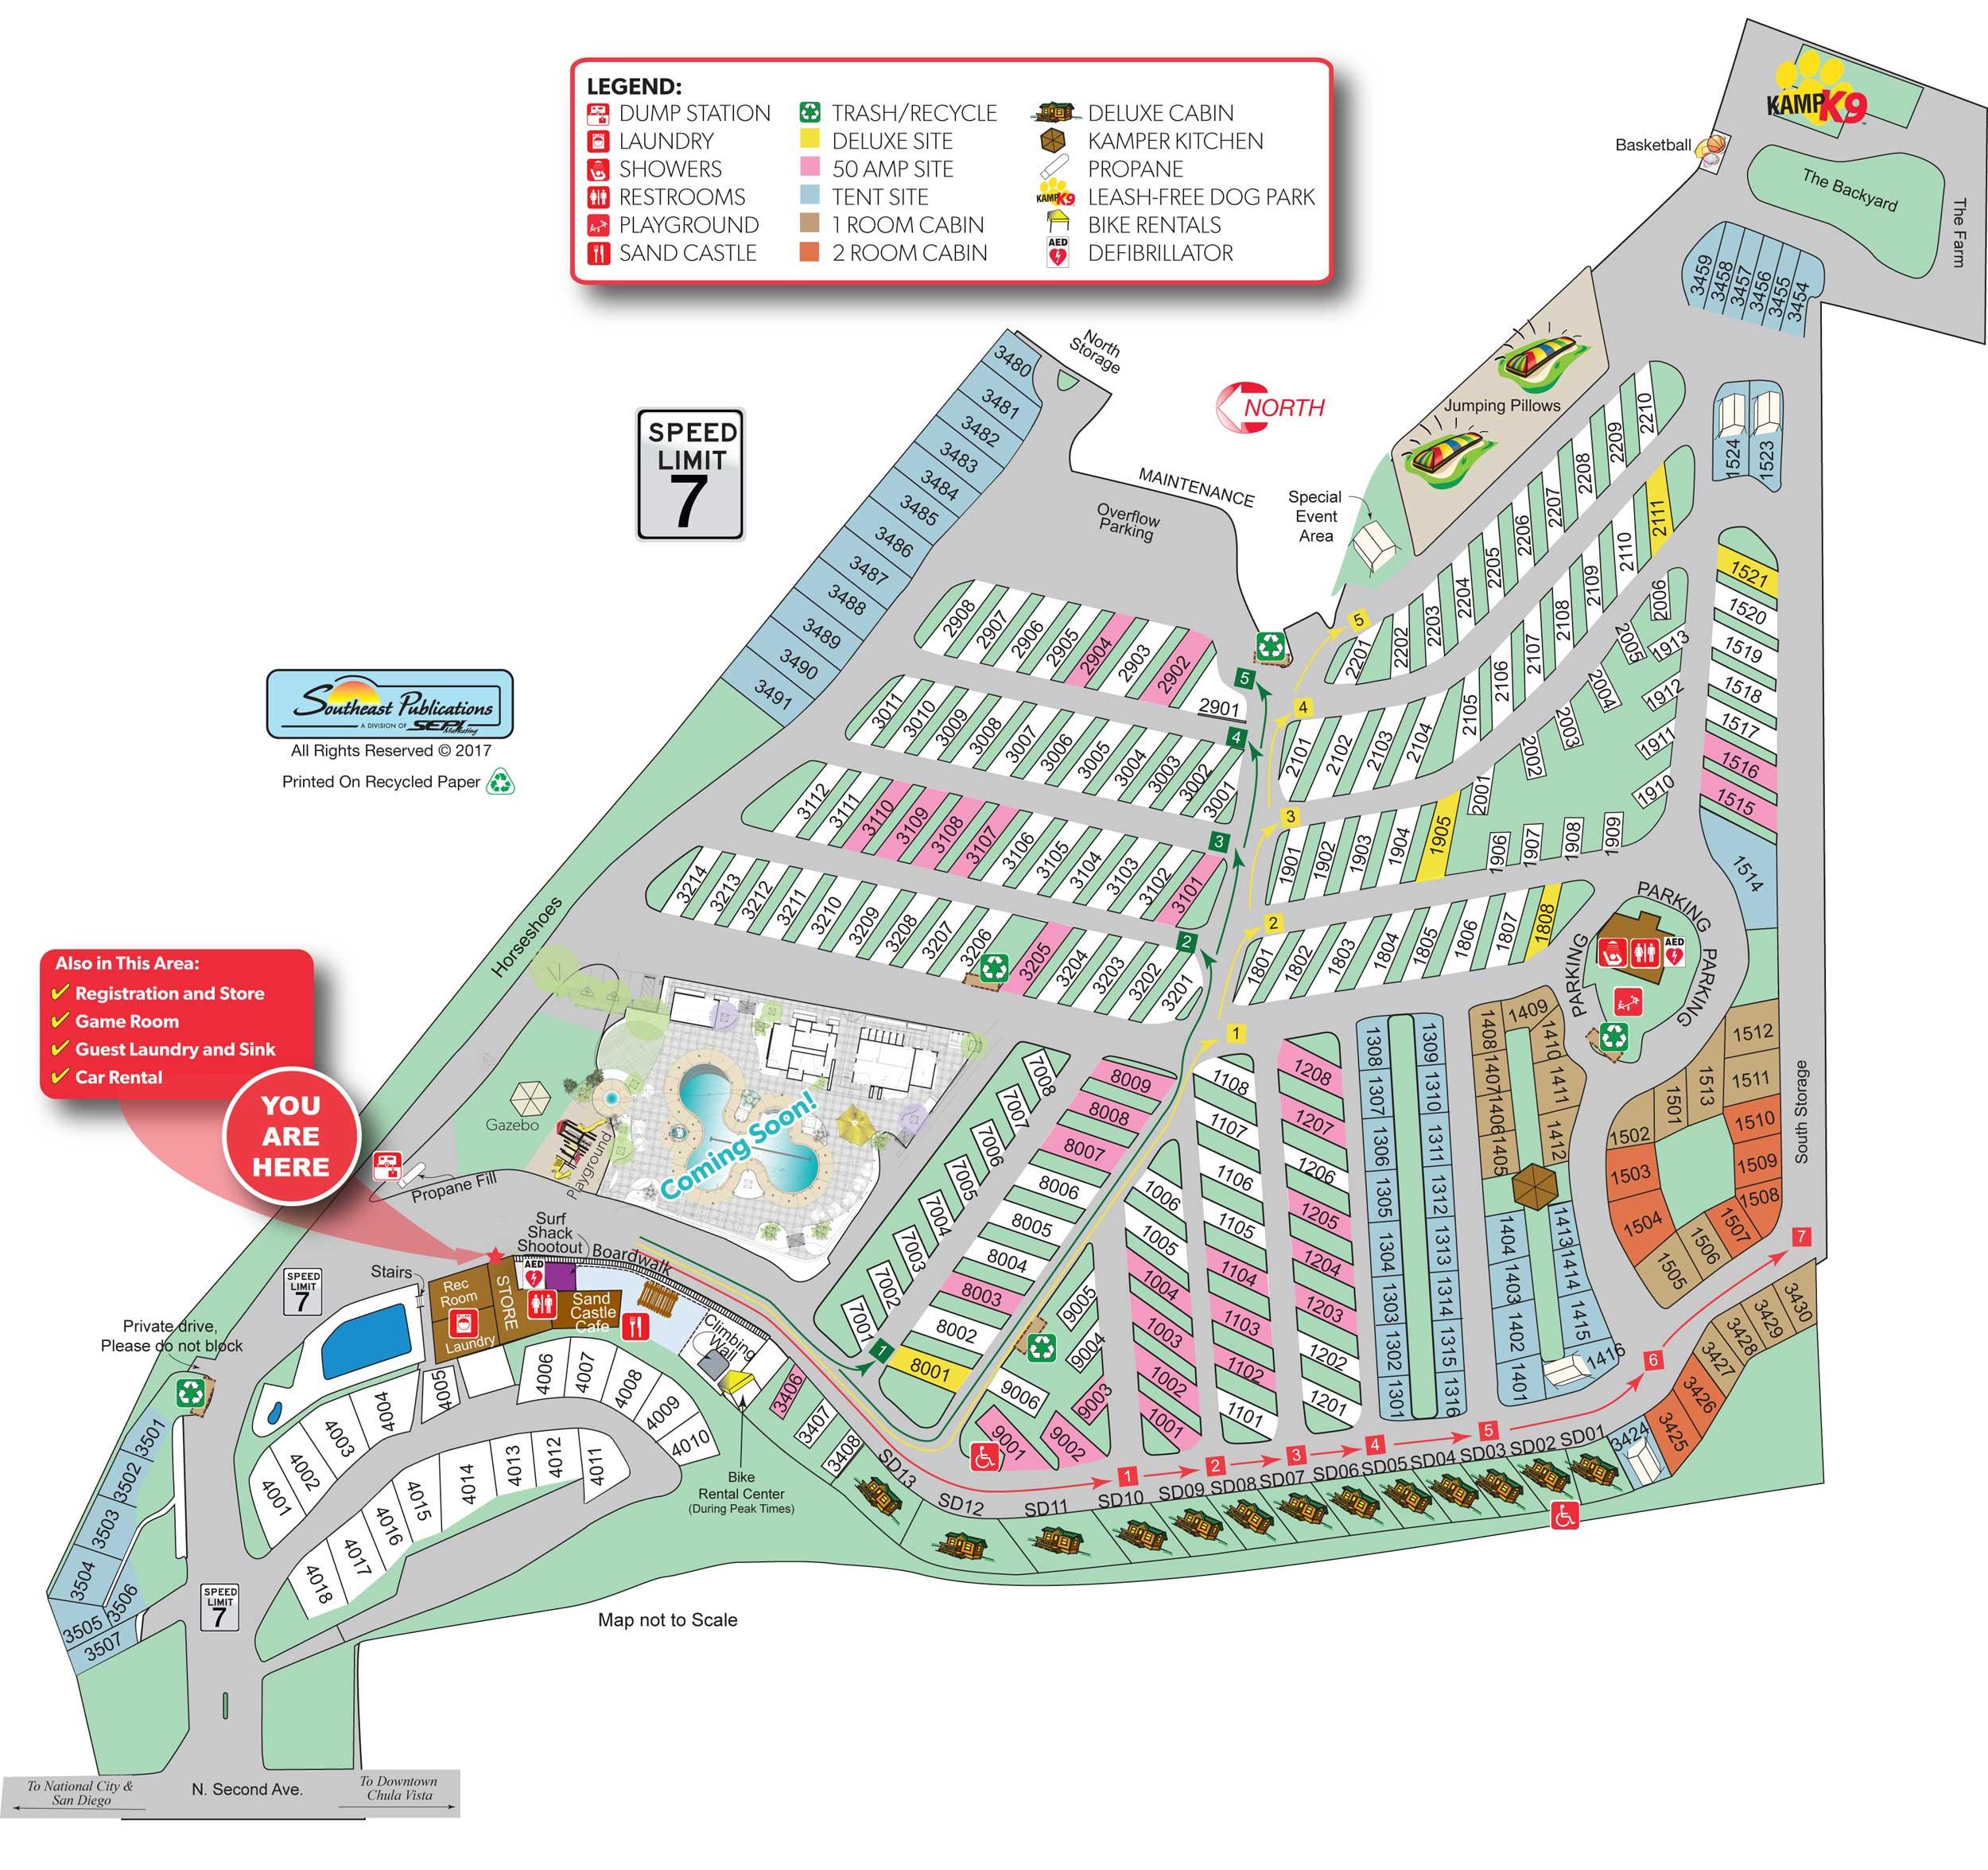 Chula Vista, California Campground | San Diego Metro Koa - California Tent Camping Map